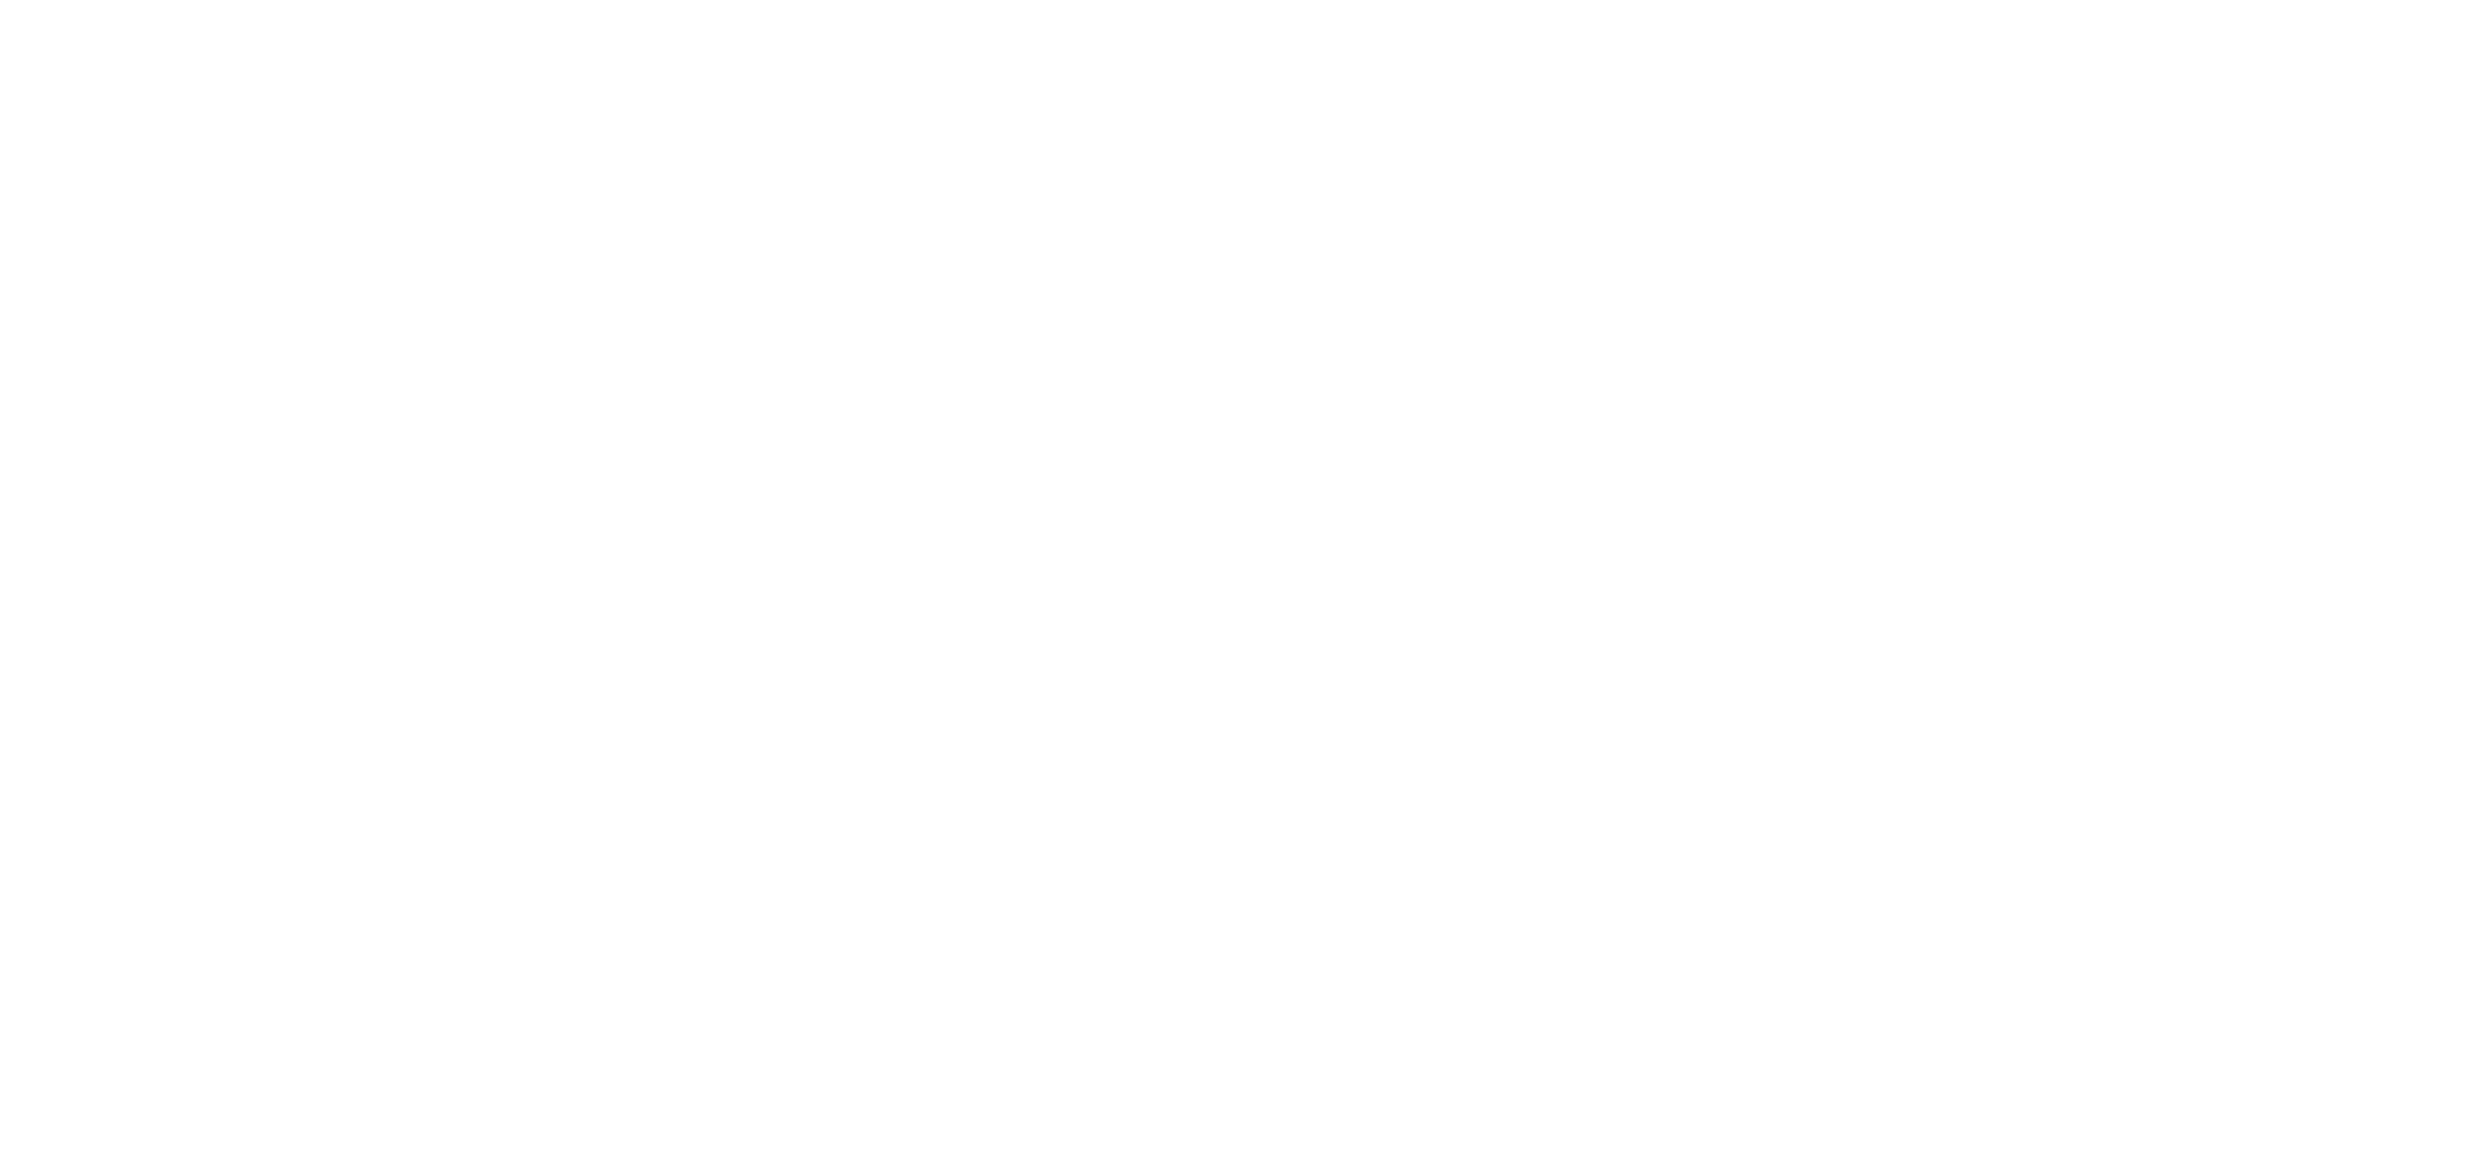 Gondwana Festival